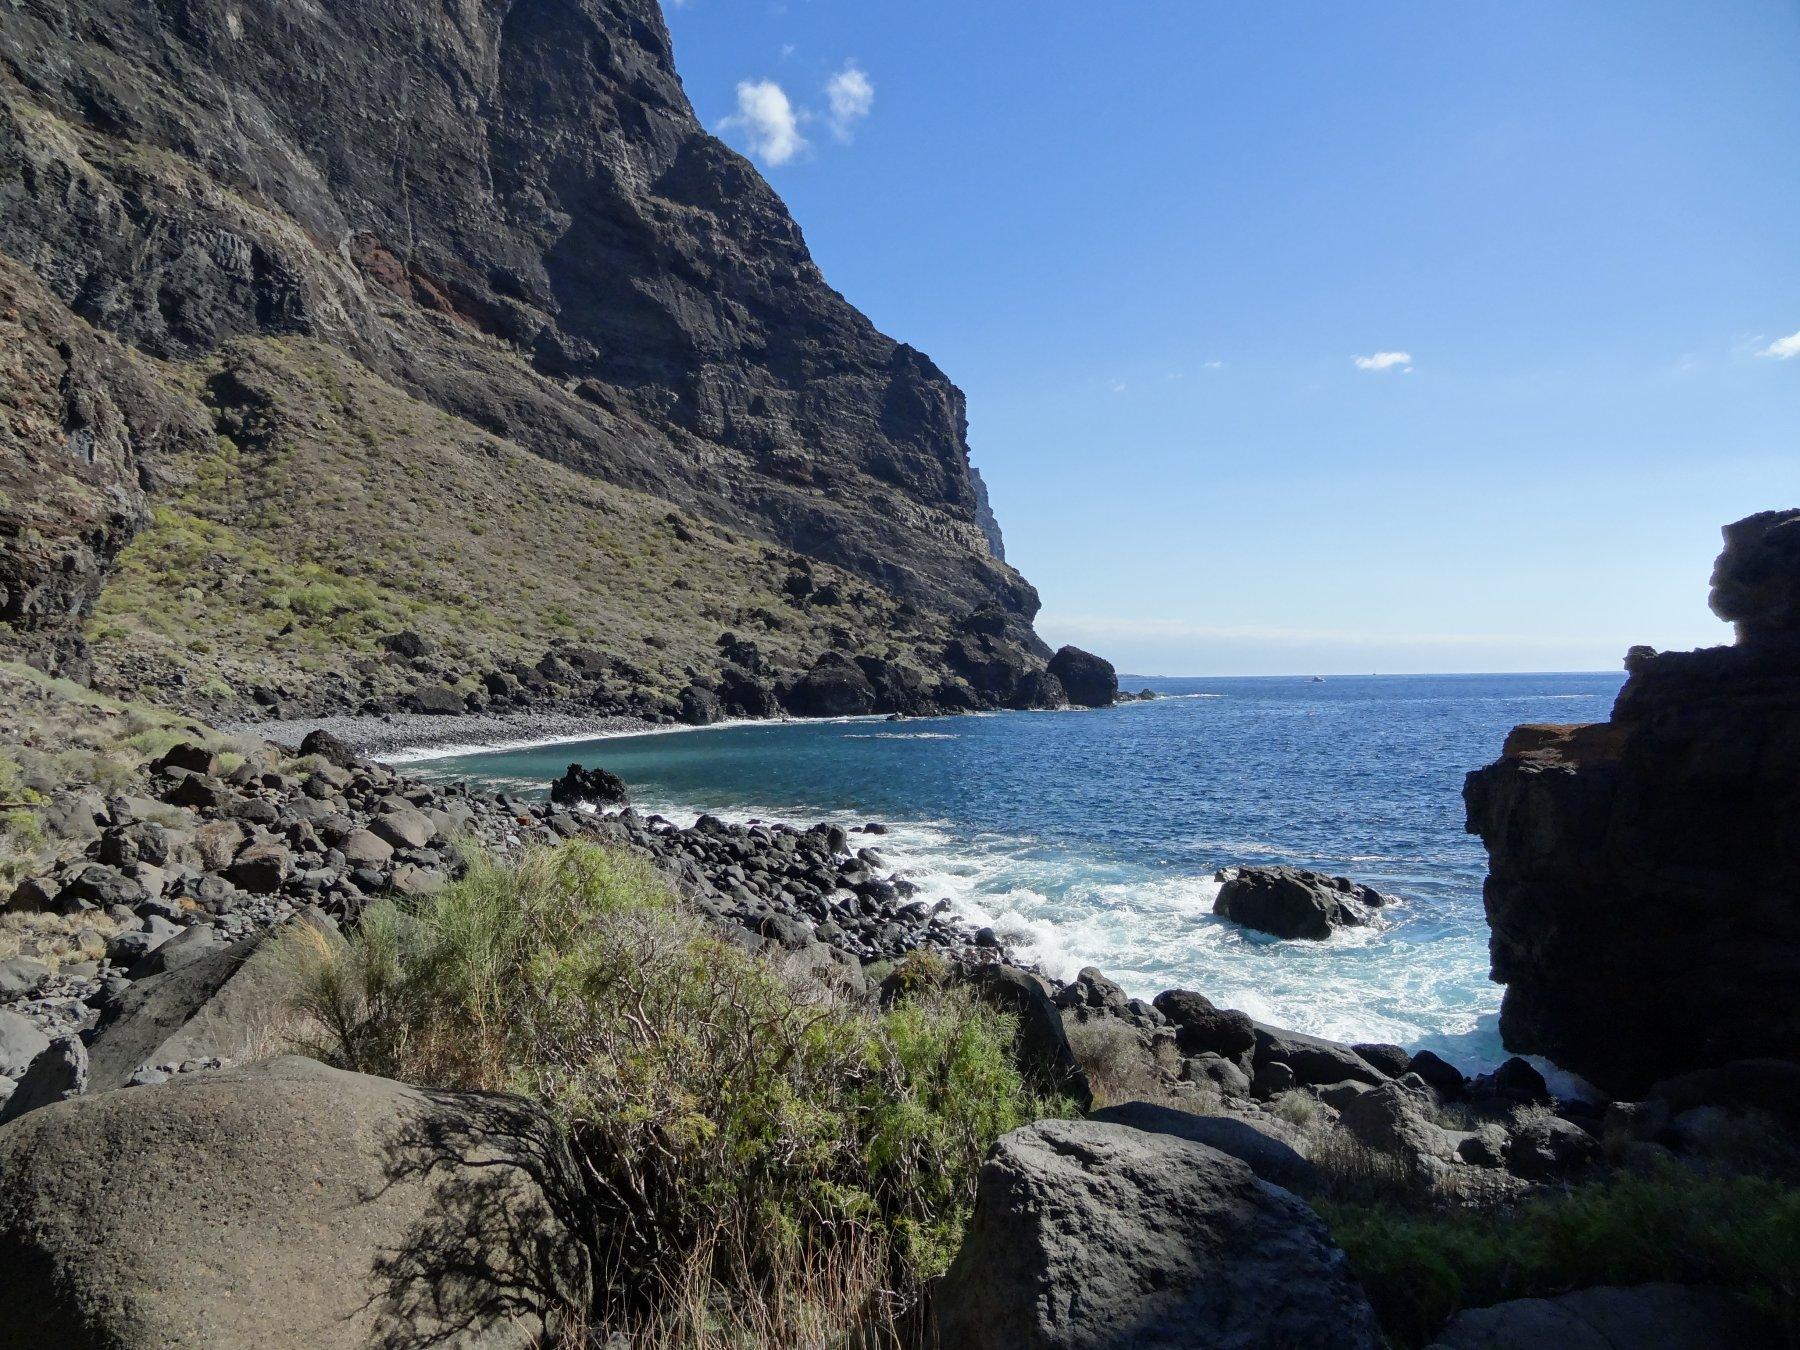 Juan Lopez (Playa) da Los Gigantes - Tenerife 2018-11-11